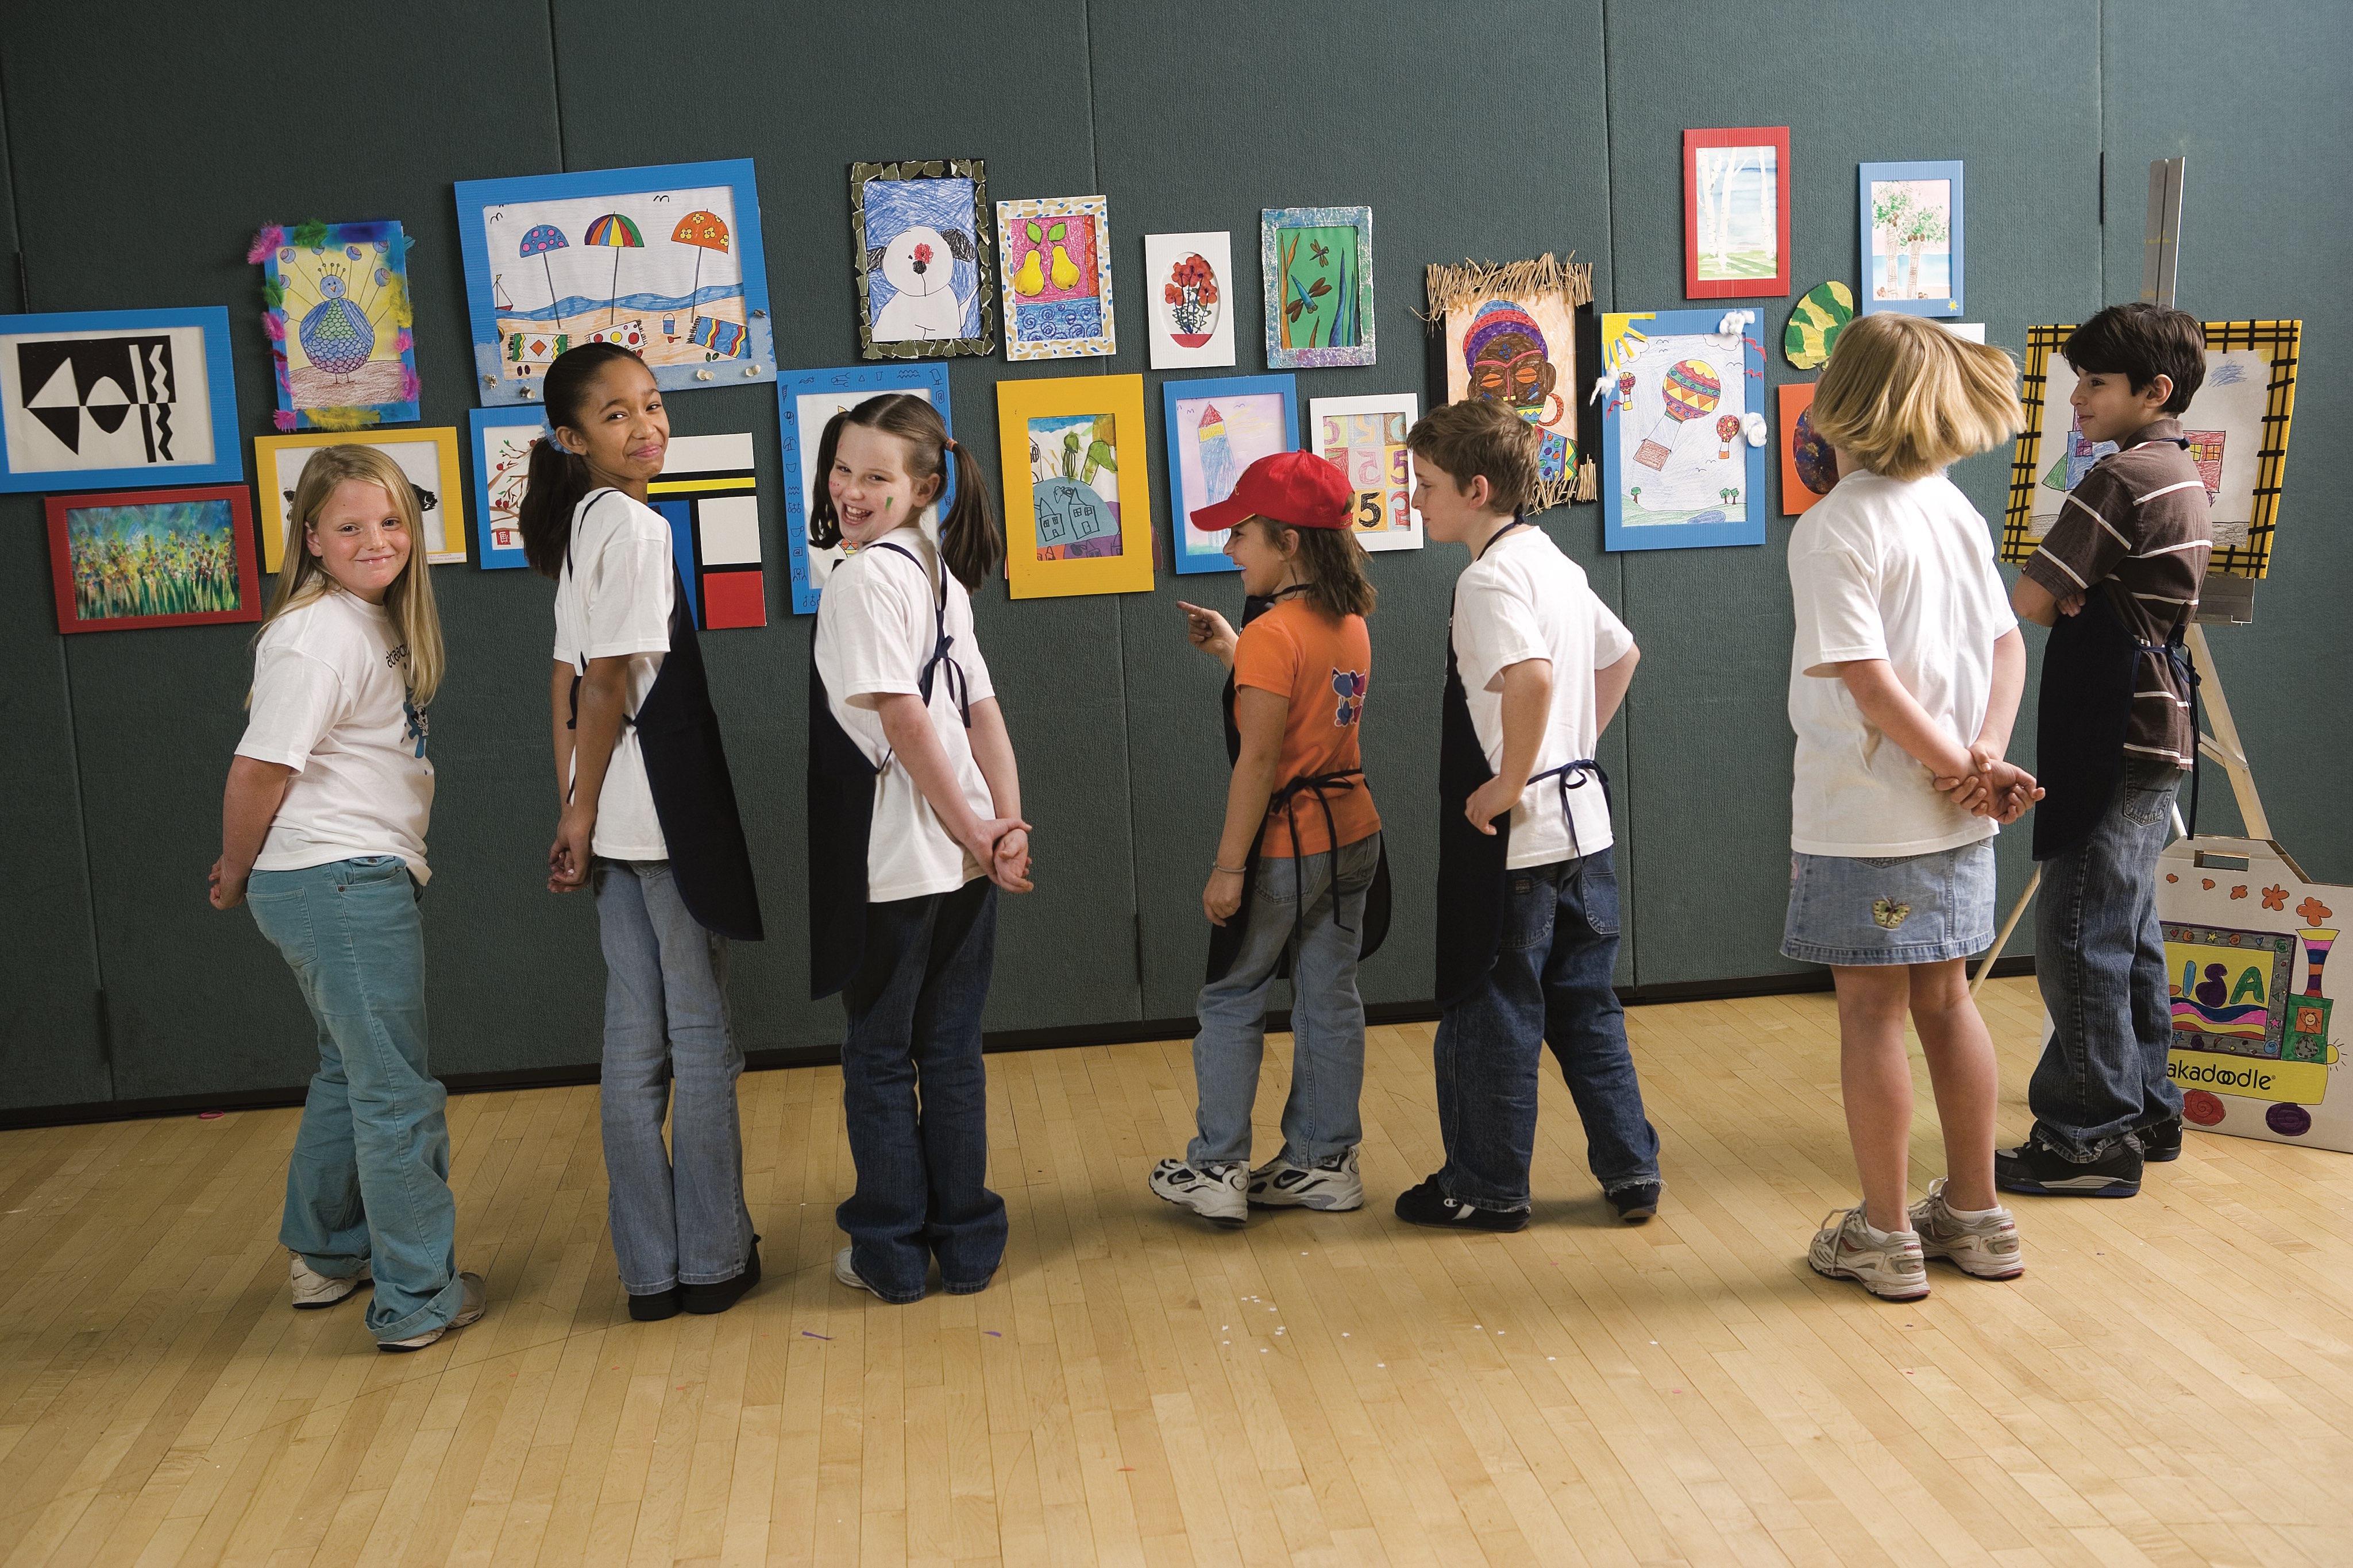 Abrakadoodle Elementary Art Camp